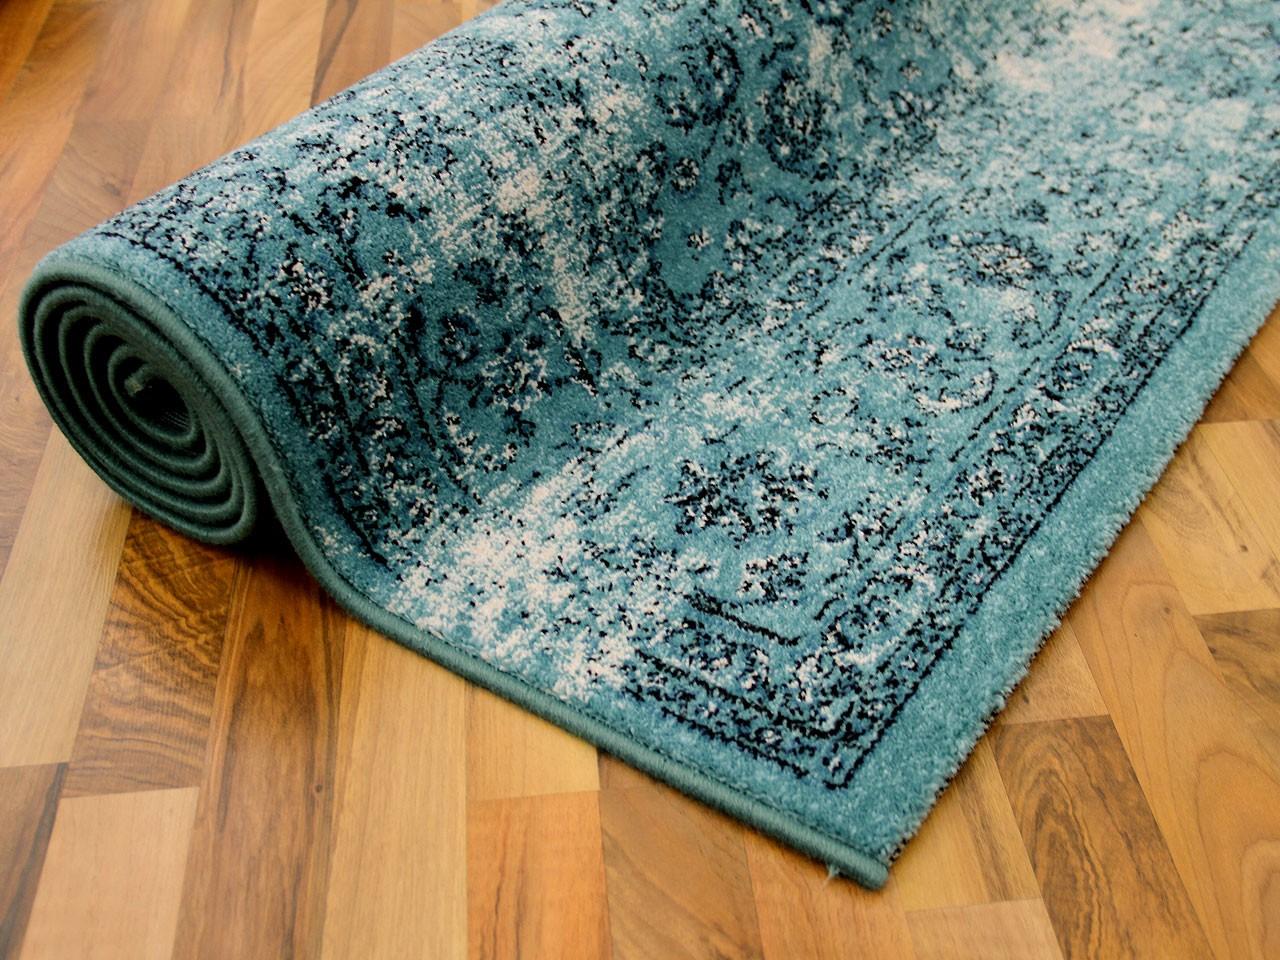 designer teppich arizona vintage orient t rkis teppiche designerteppiche arizona teppiche. Black Bedroom Furniture Sets. Home Design Ideas